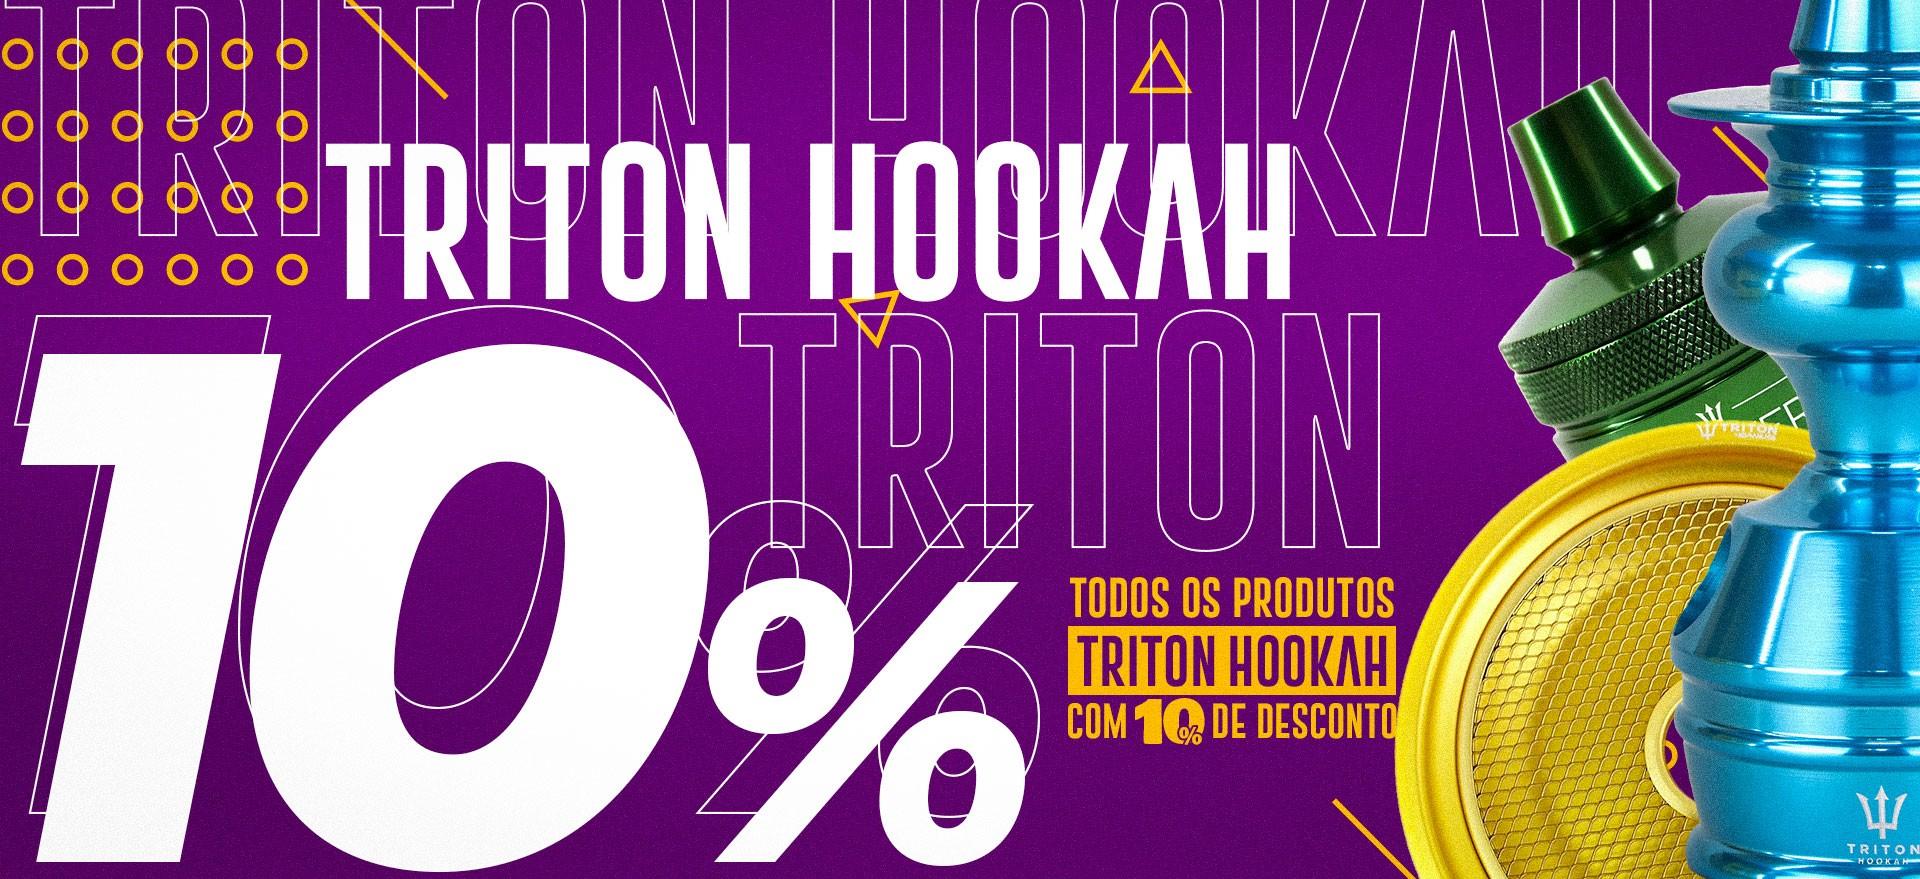 Promoção Triton Hookah 10% Narguile